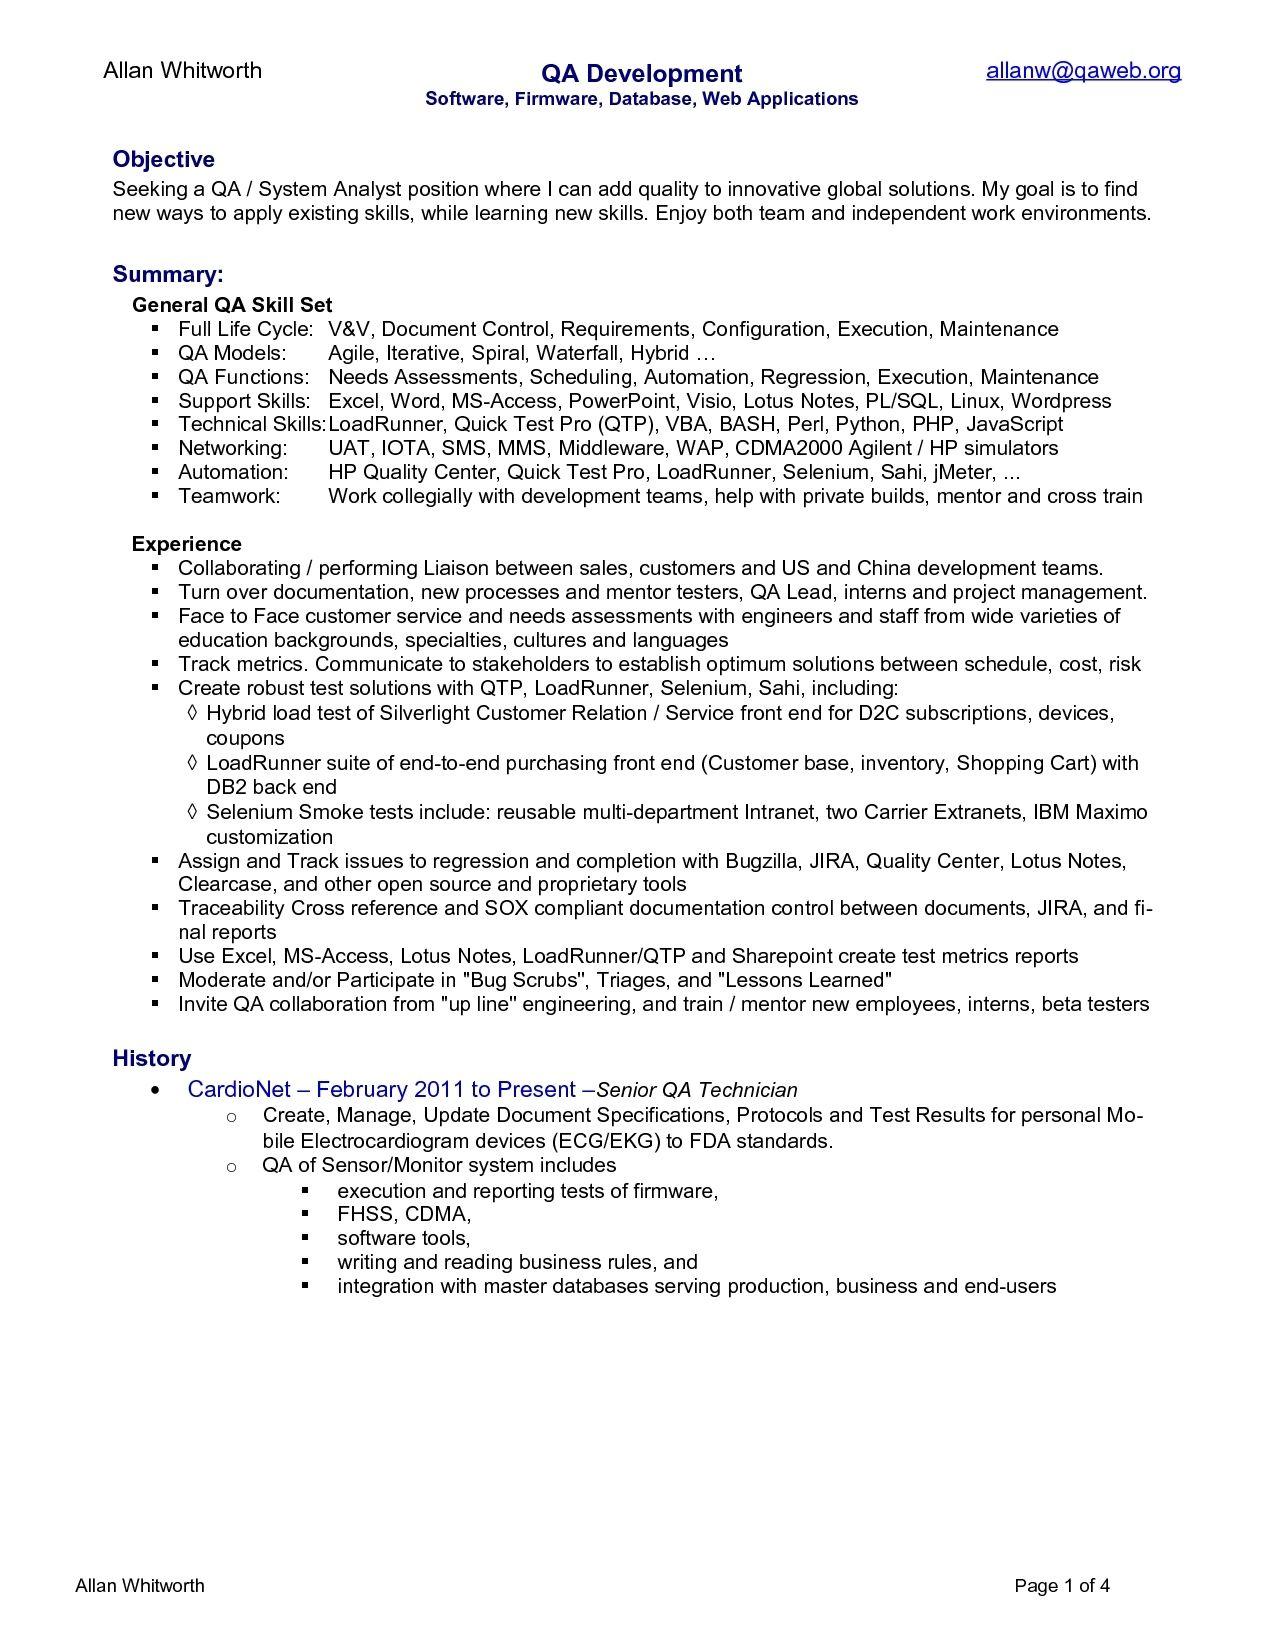 Resume Format Quality Assurance Pharma Job Resume Examples Job Resume Samples Good Resume Examples